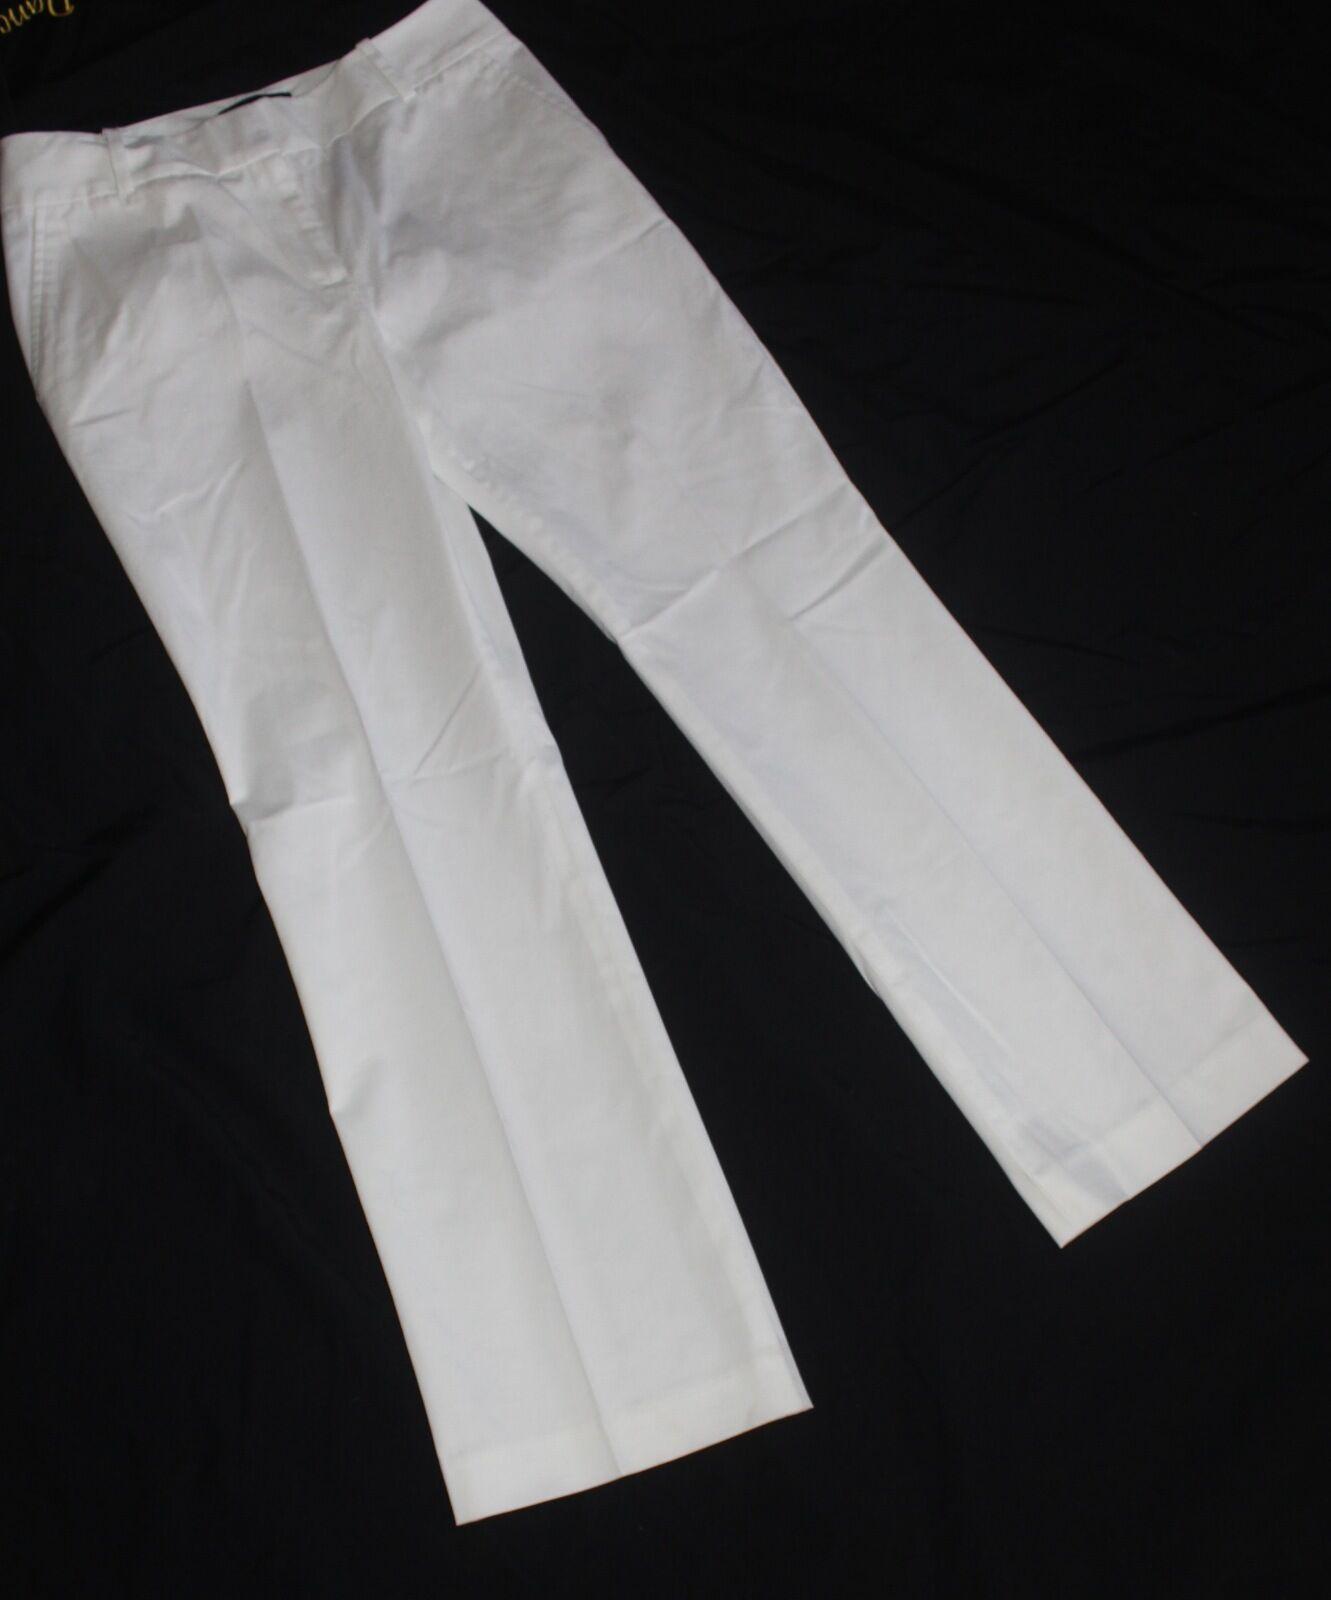 TALBOT'S PETITE HERTAGE WHITE PANTS SIZE 6P NWT RETAILS FOR 79.50